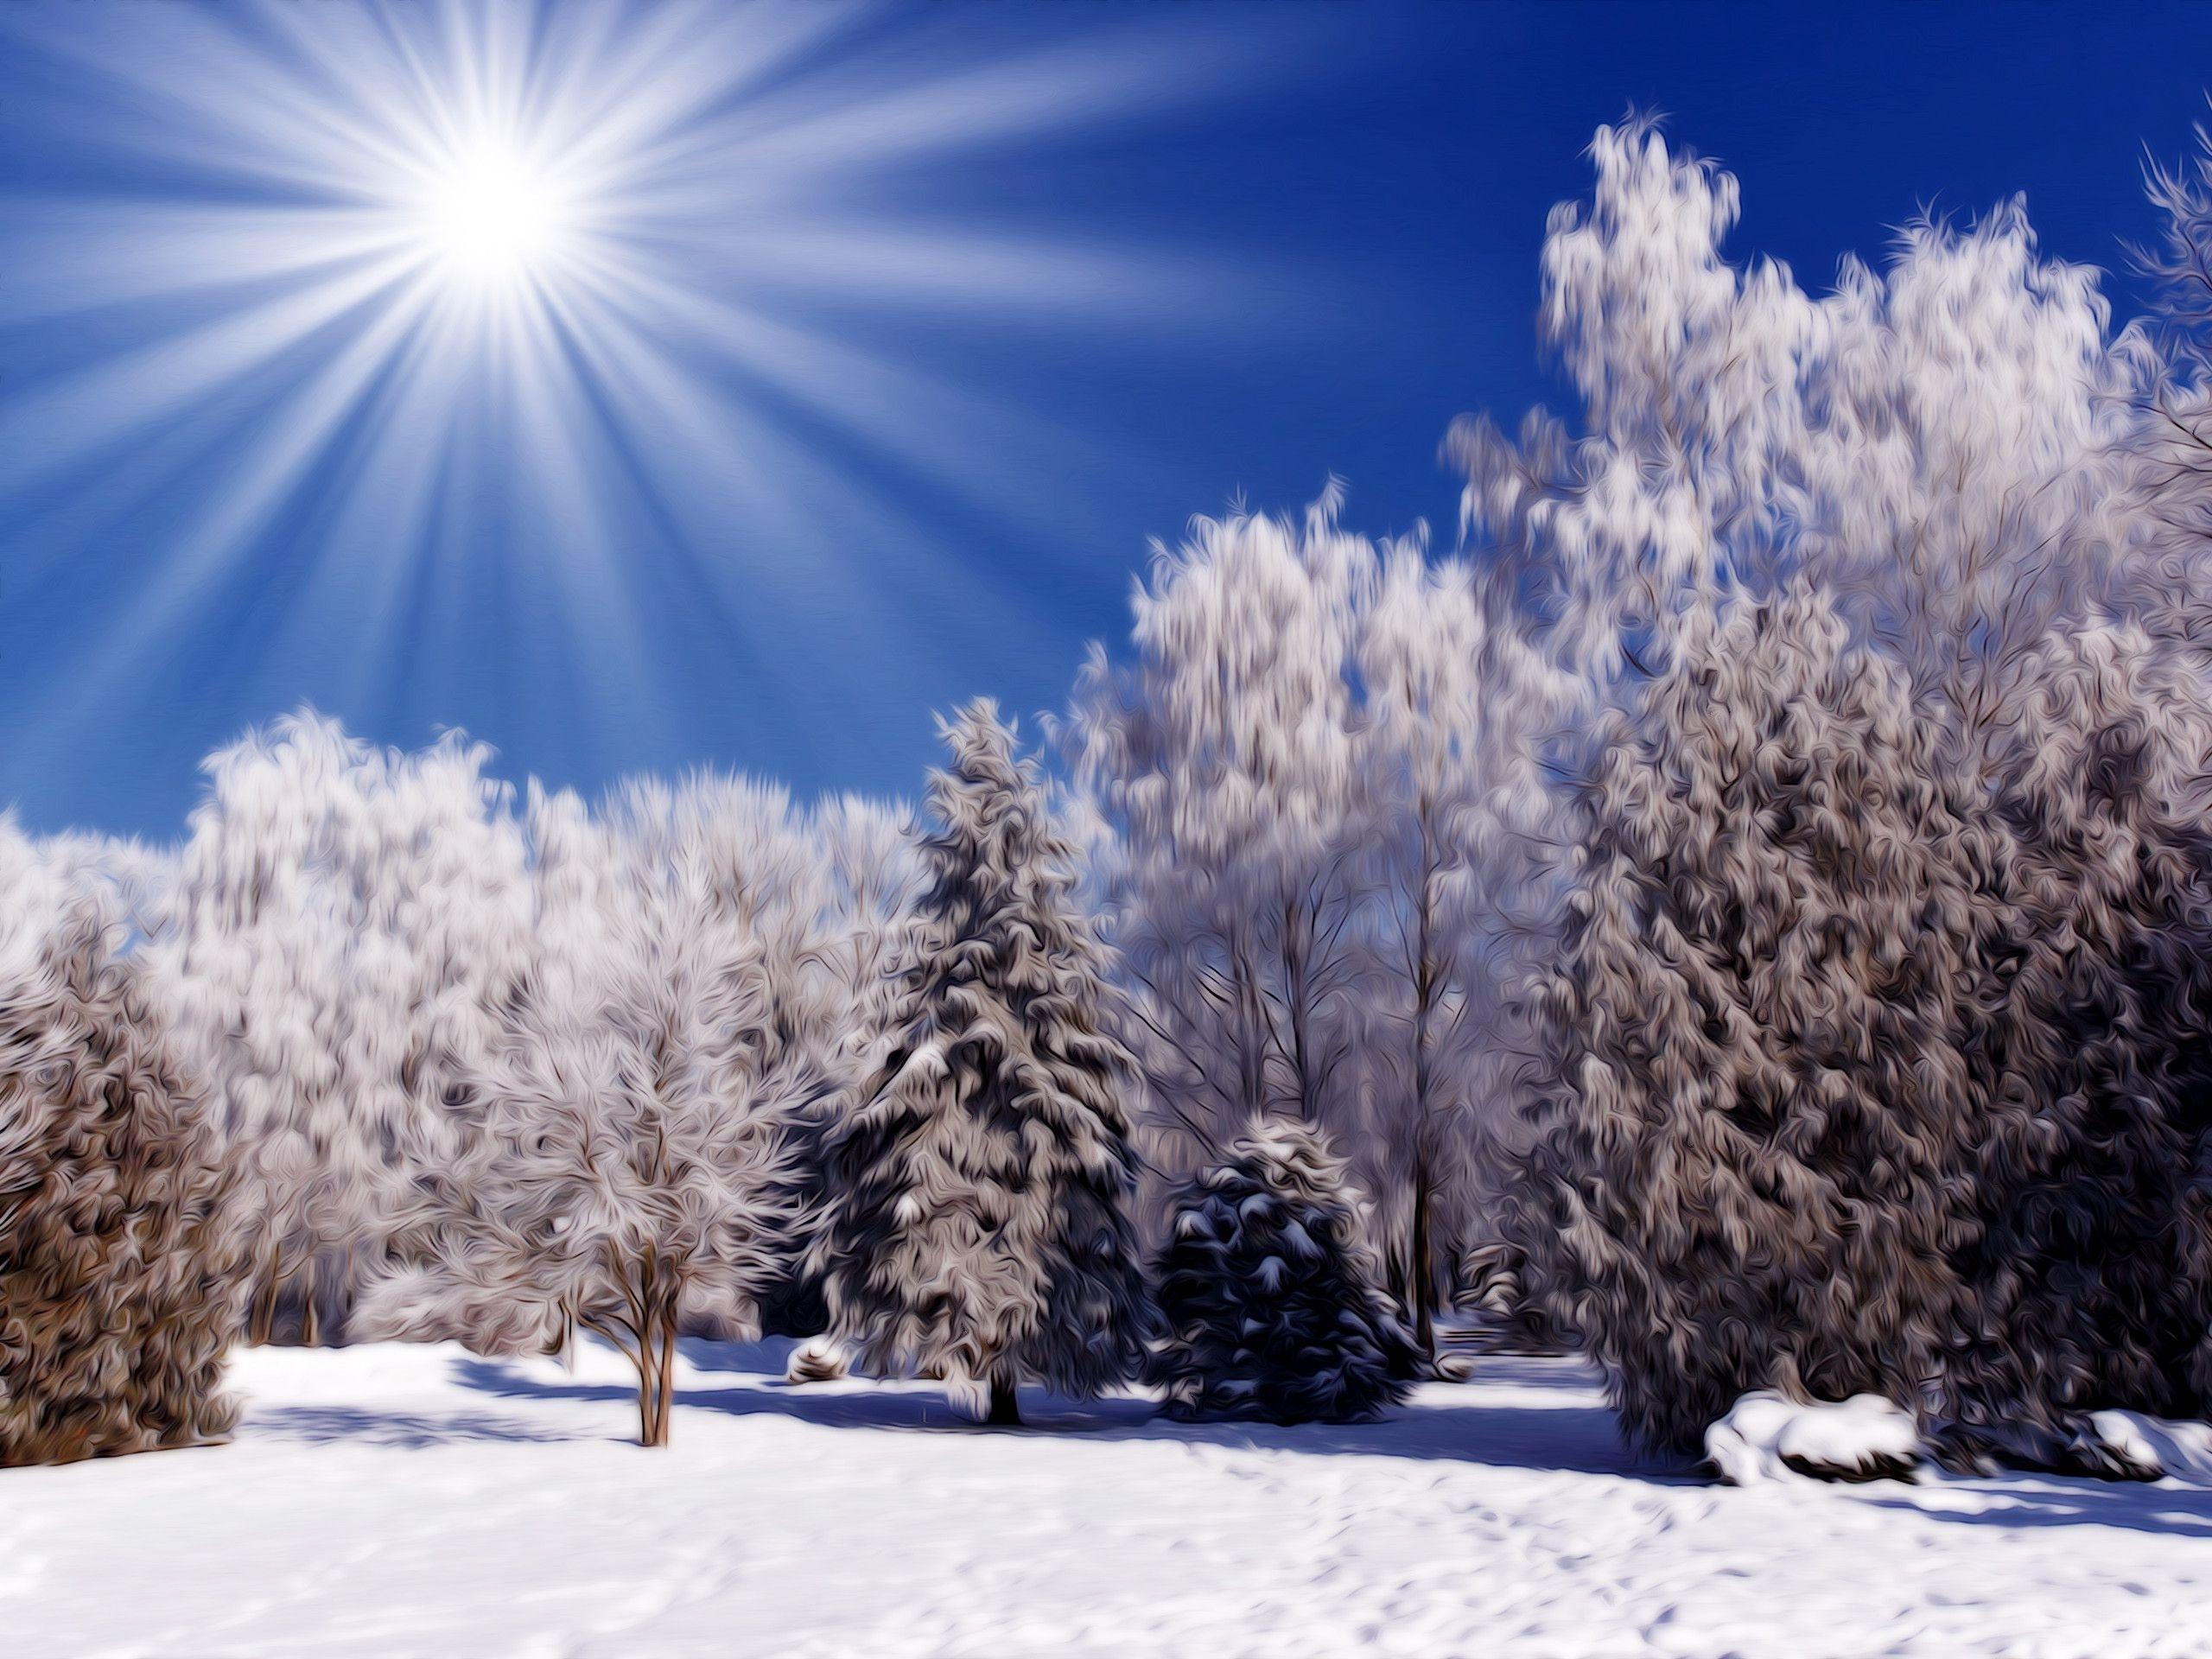 free desktop wallpapers winter scenes - wallpaper cave | all